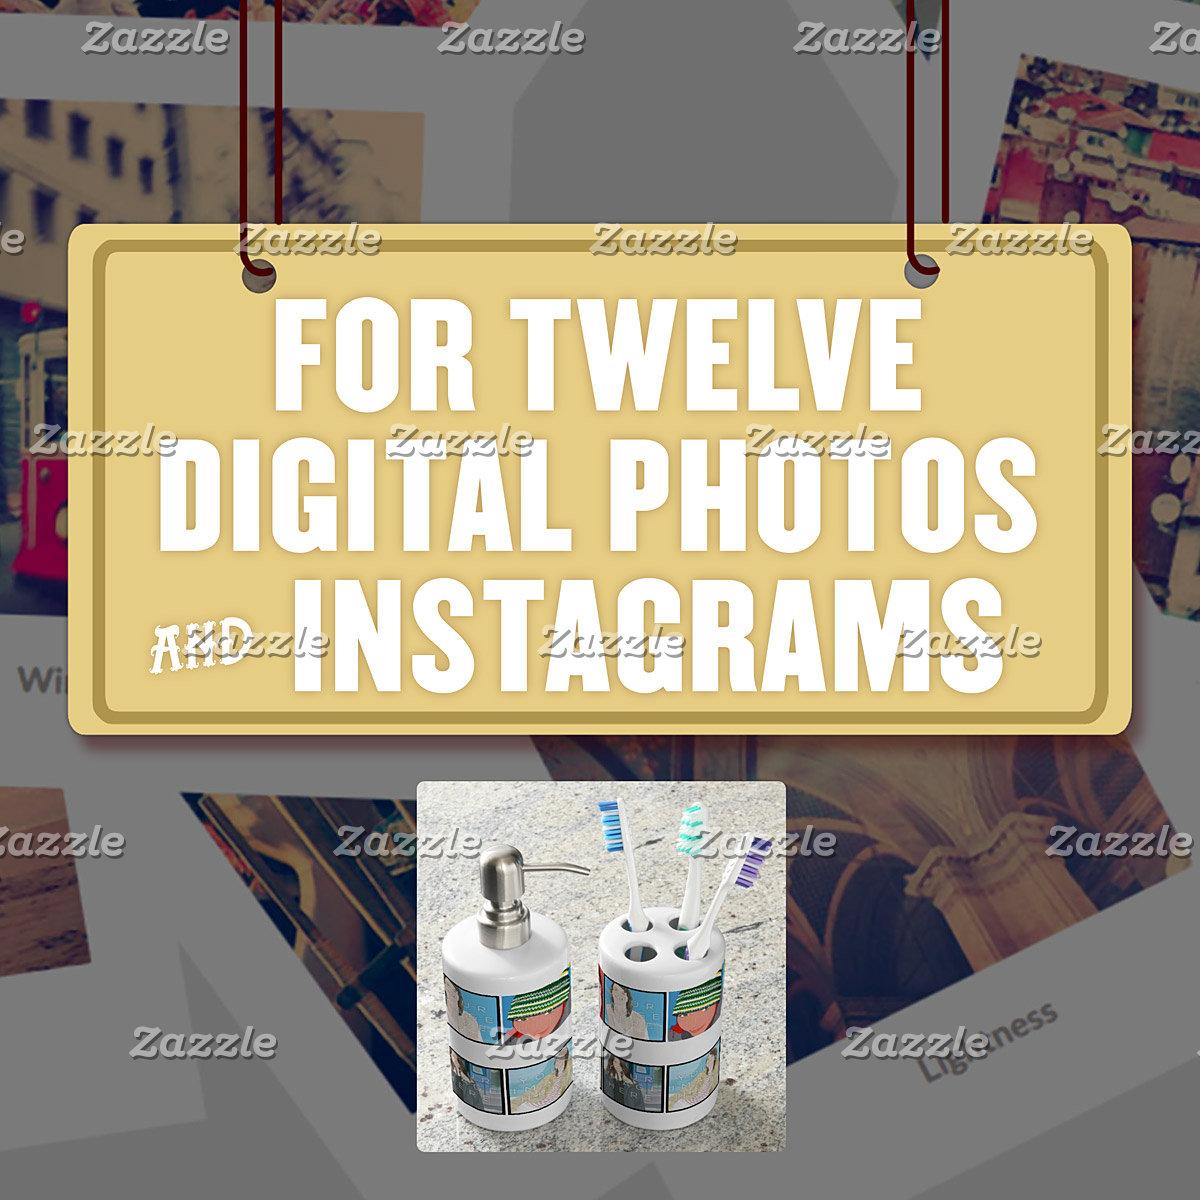 For Twelve (12) Digital Photos & Instagrams